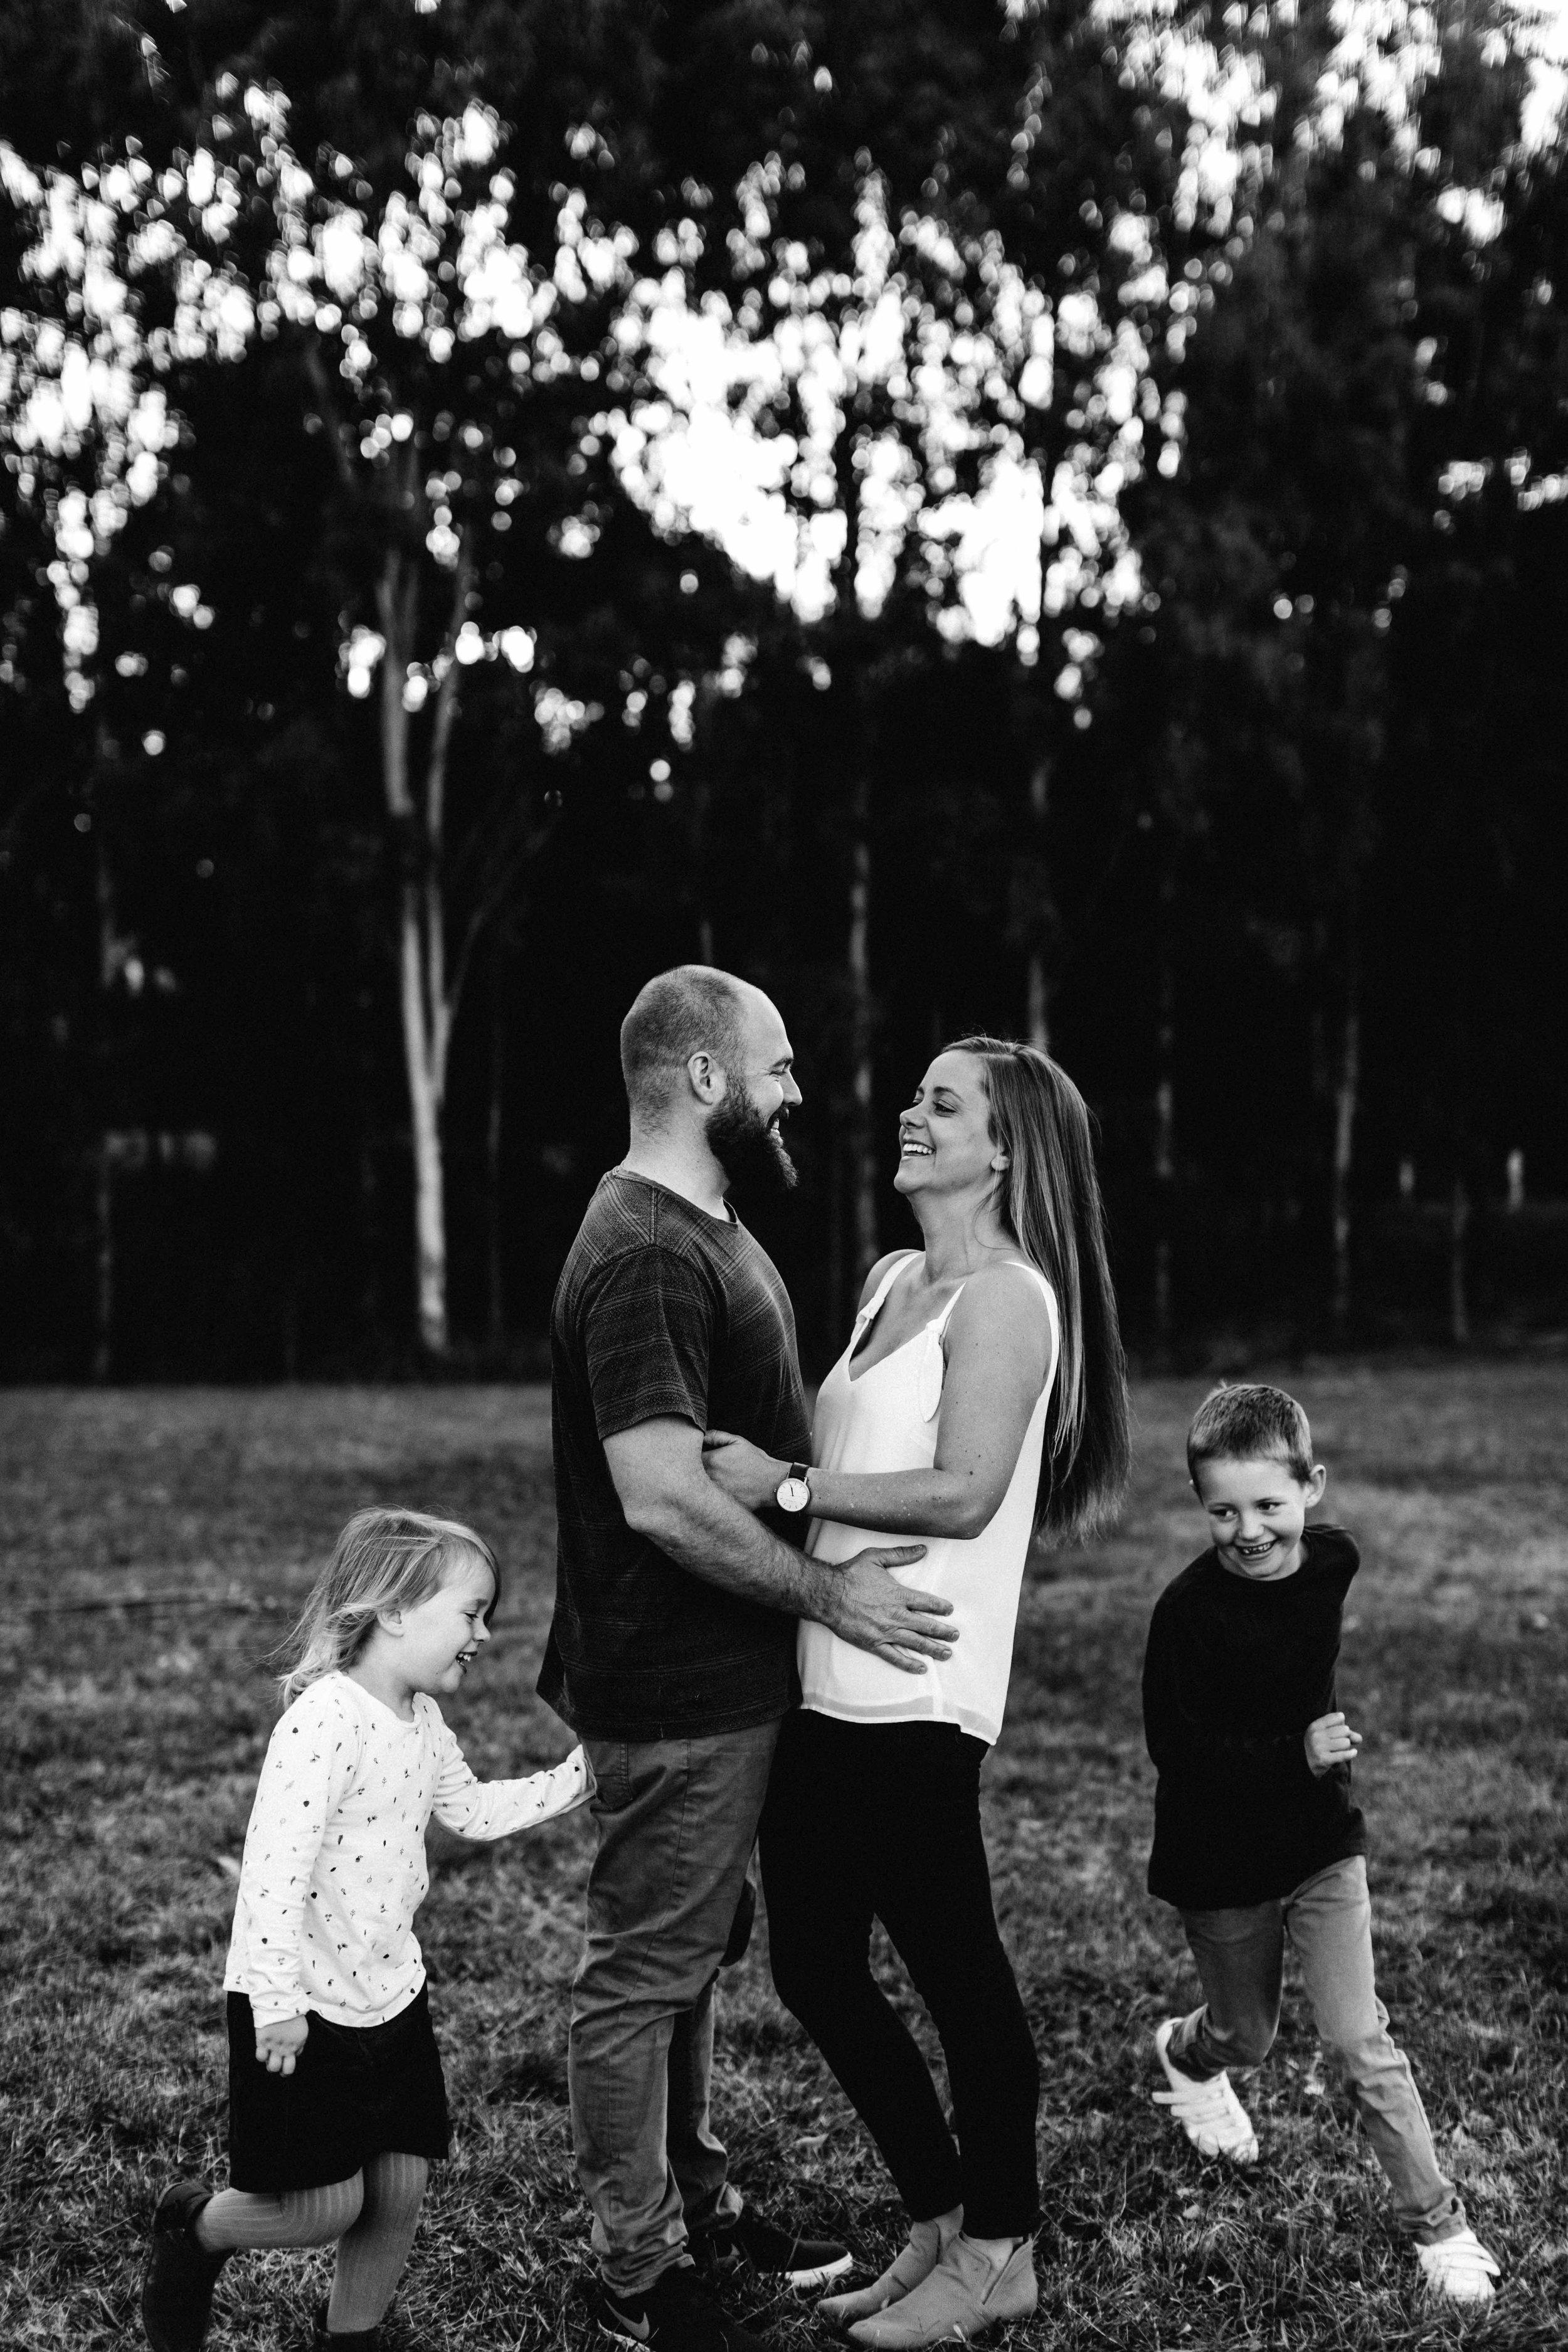 camden-family-photography-boot-family-session-32.jpg